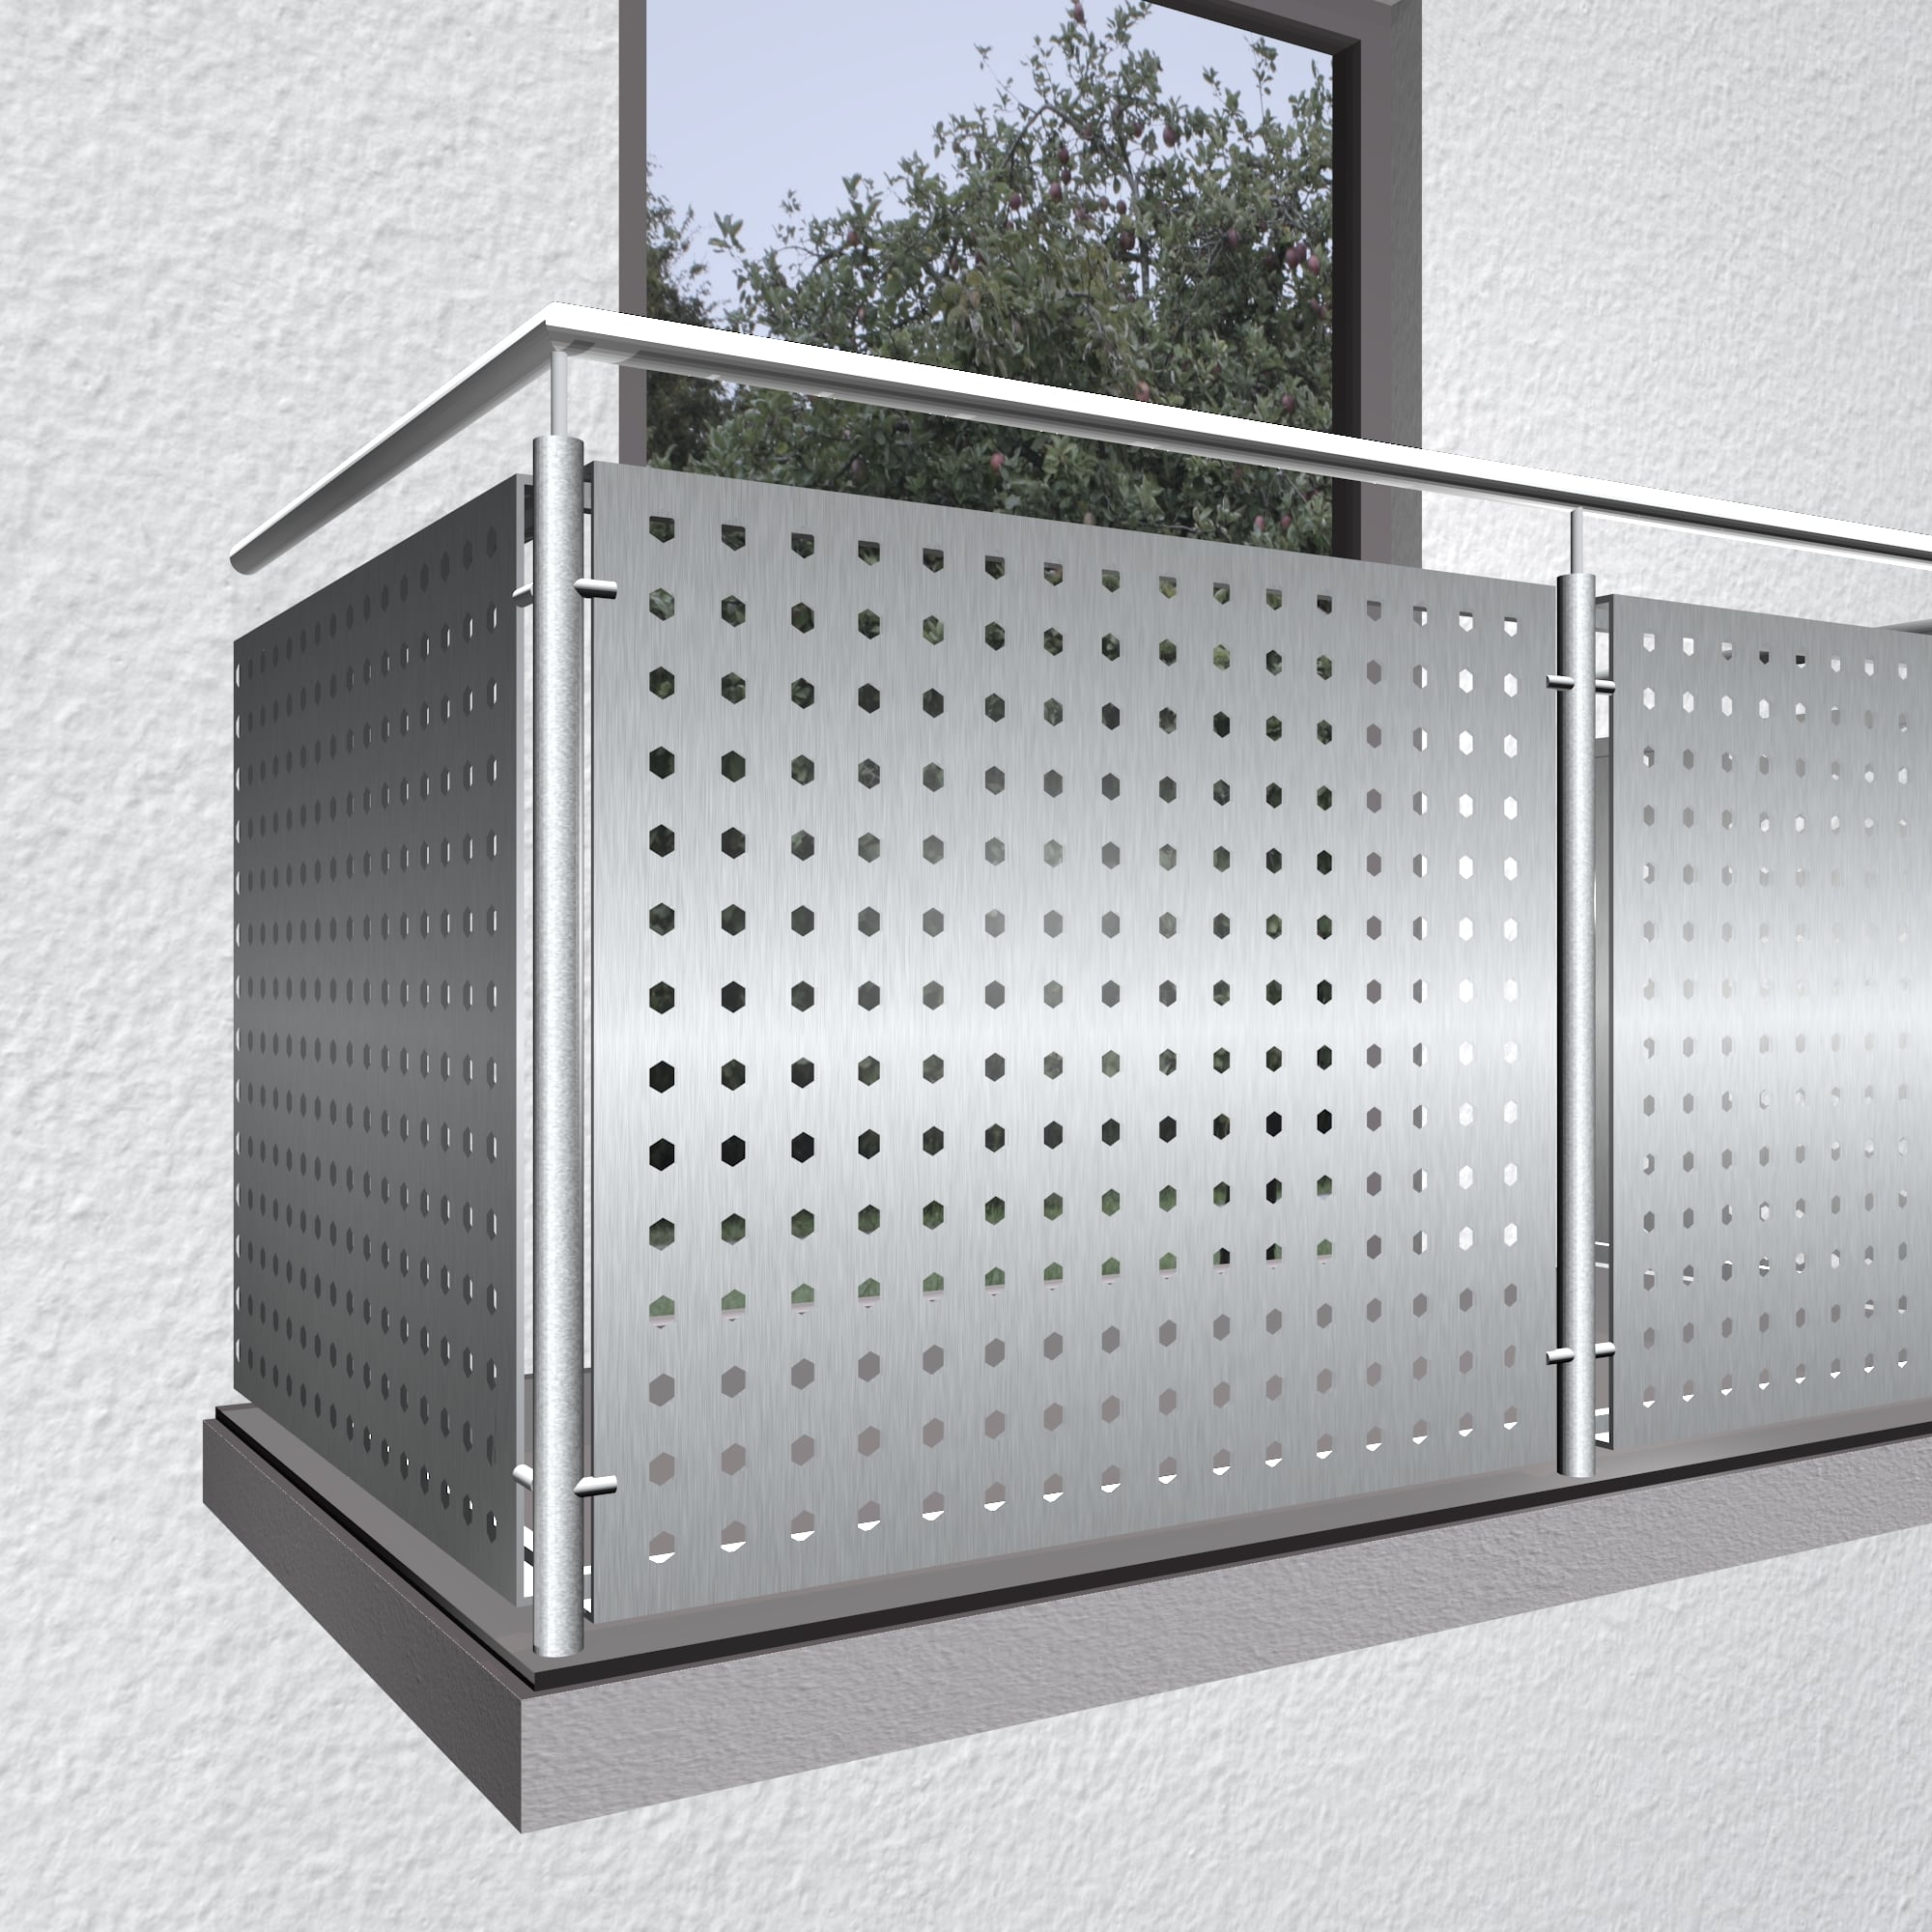 Balkonverkleidung Edelstahl SK GE